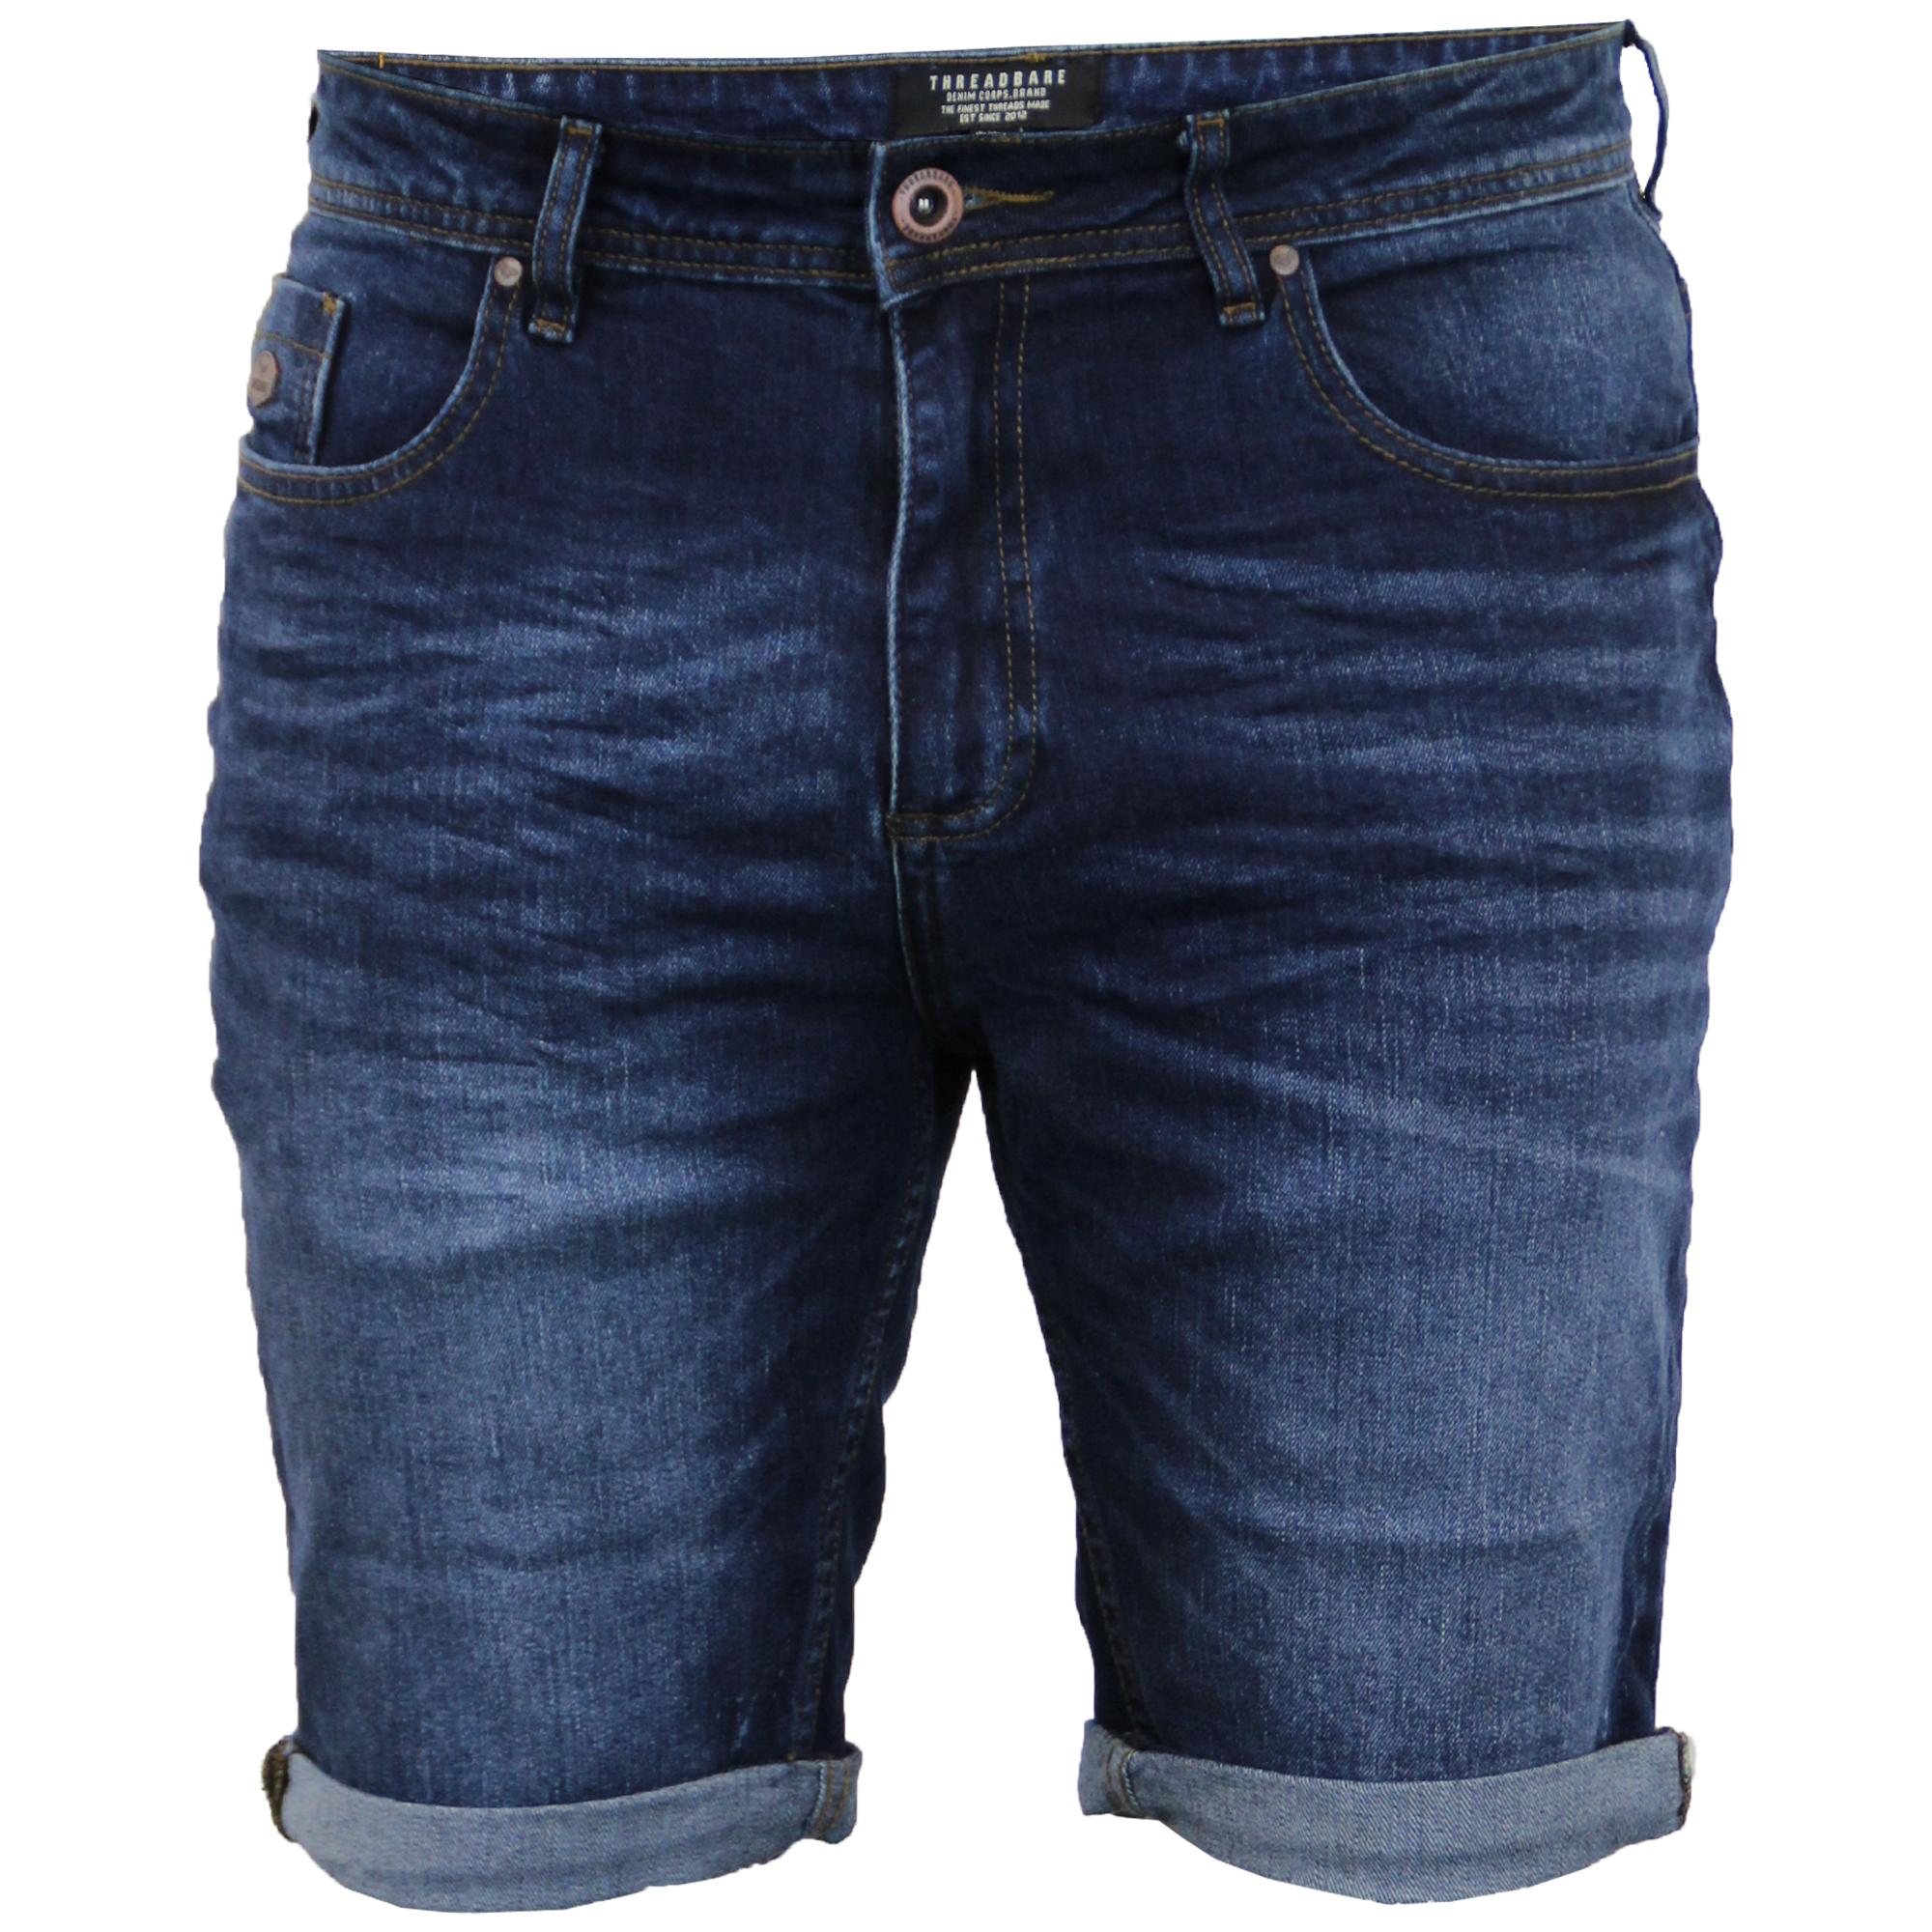 Mens Denim Shorts Threadbare Knee Length Jean Roll Up Stretch ...